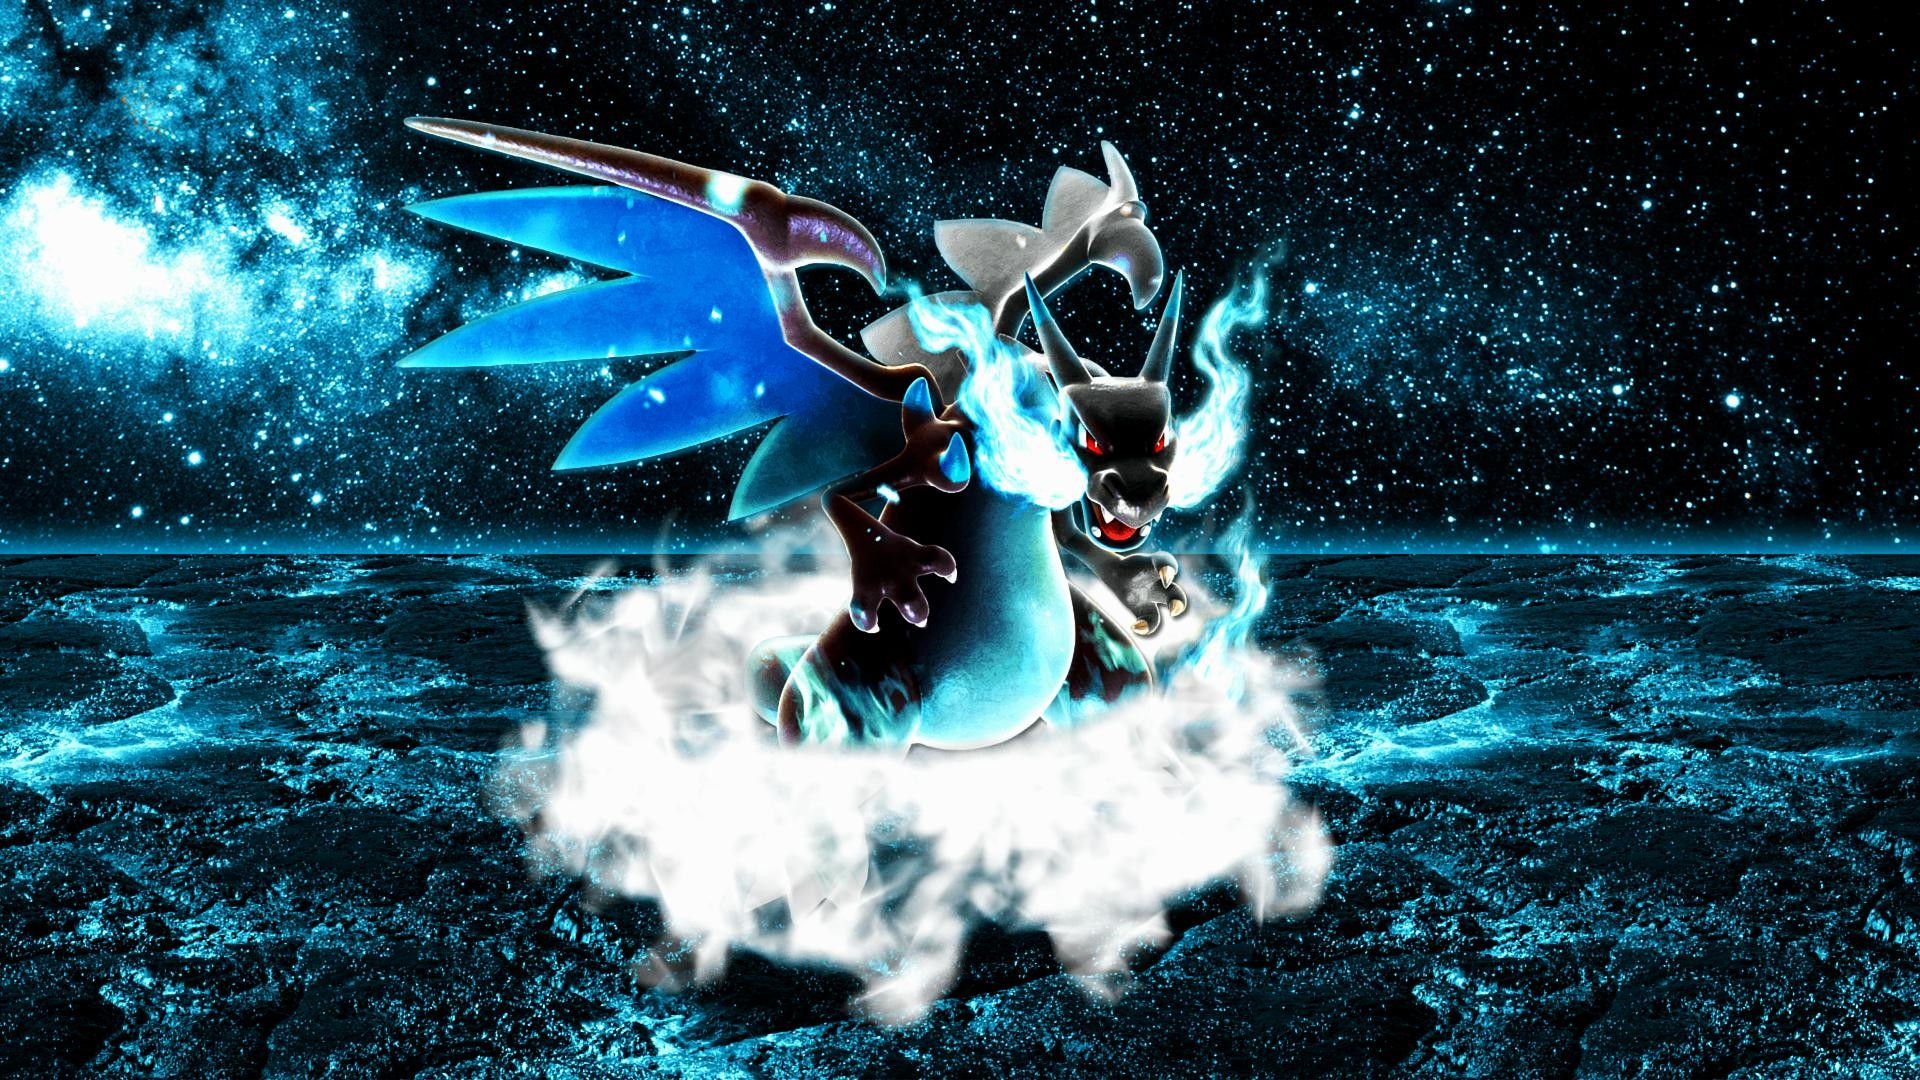 Pokemon-Charizard-Images-HD